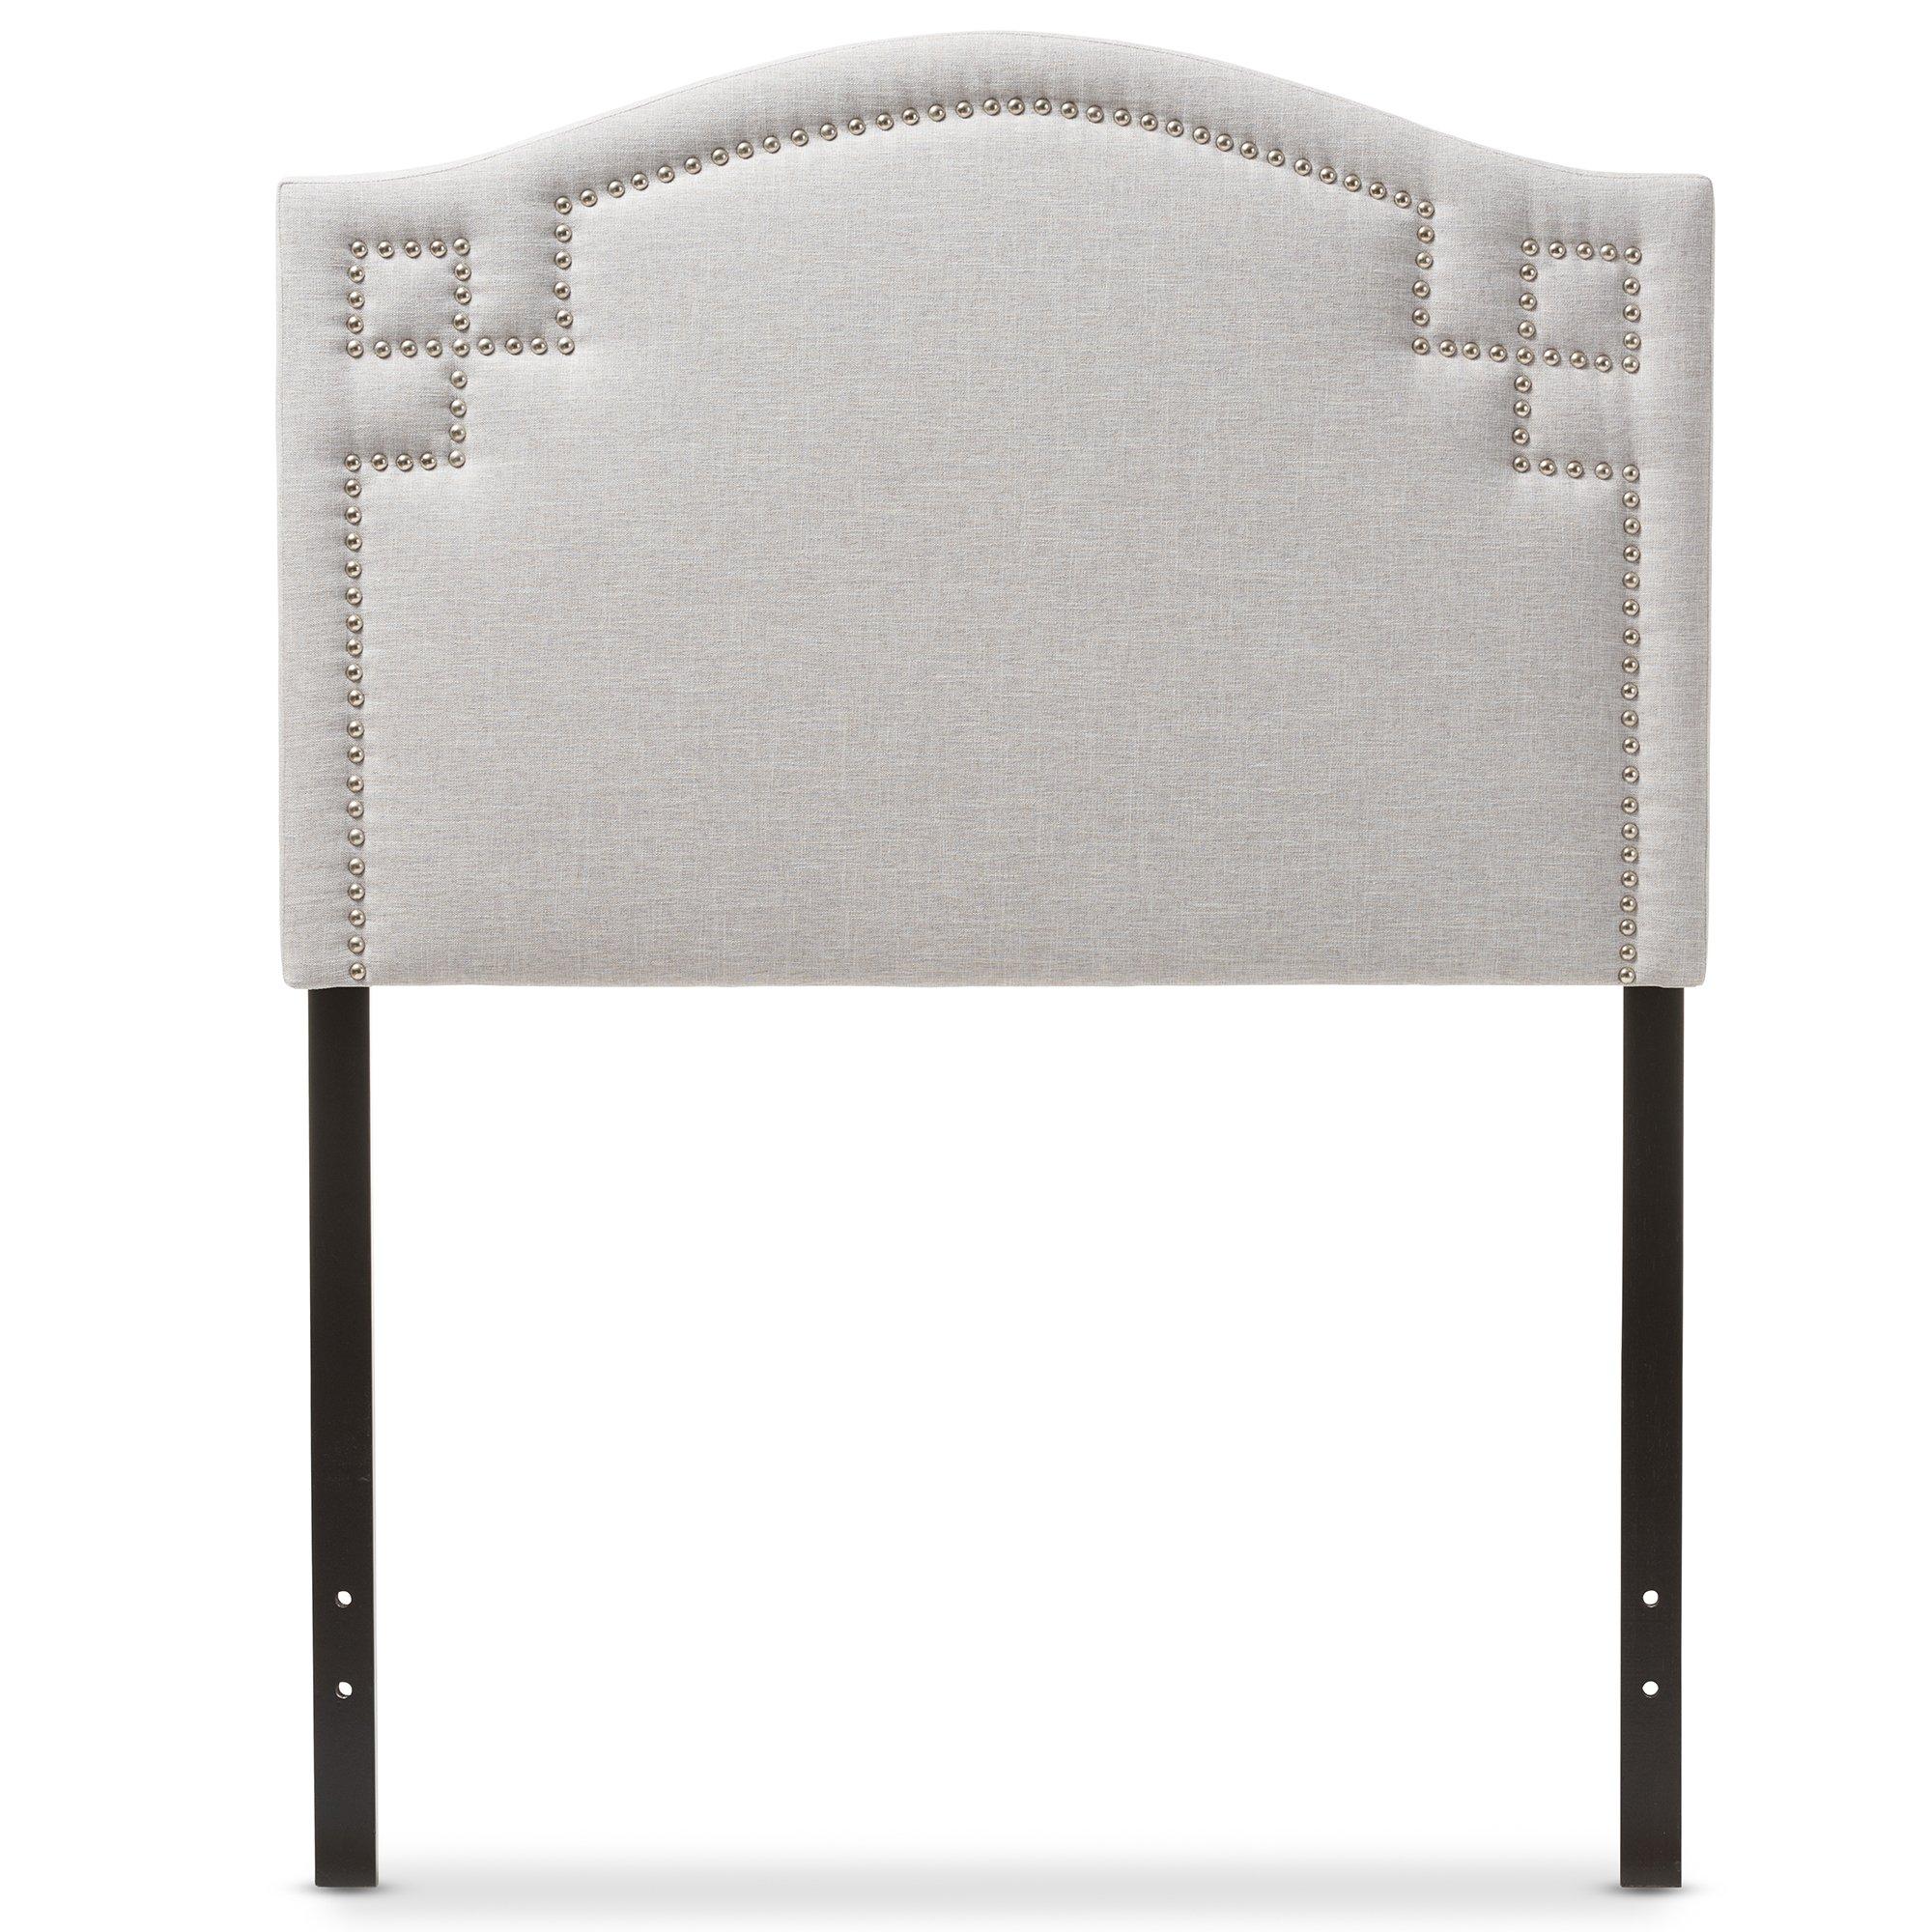 Baxton Studio Aure Modern and Contemporary Kids Bedroom Greyish Beige Fabric Upholstered Headboard, Twin